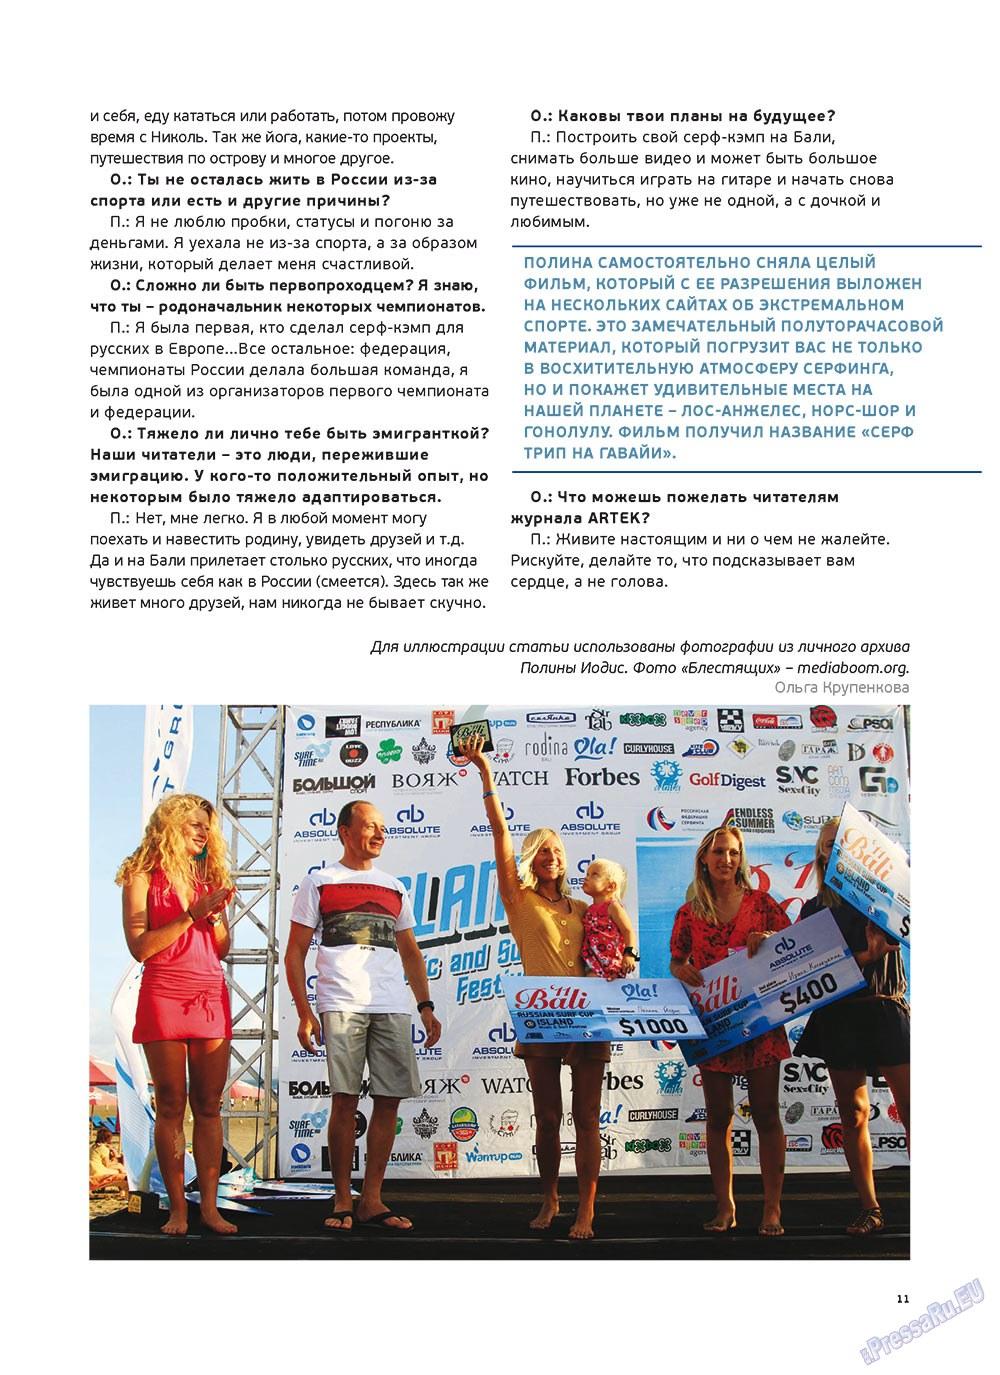 Артек (журнал). 2012 год, номер 2, стр. 13